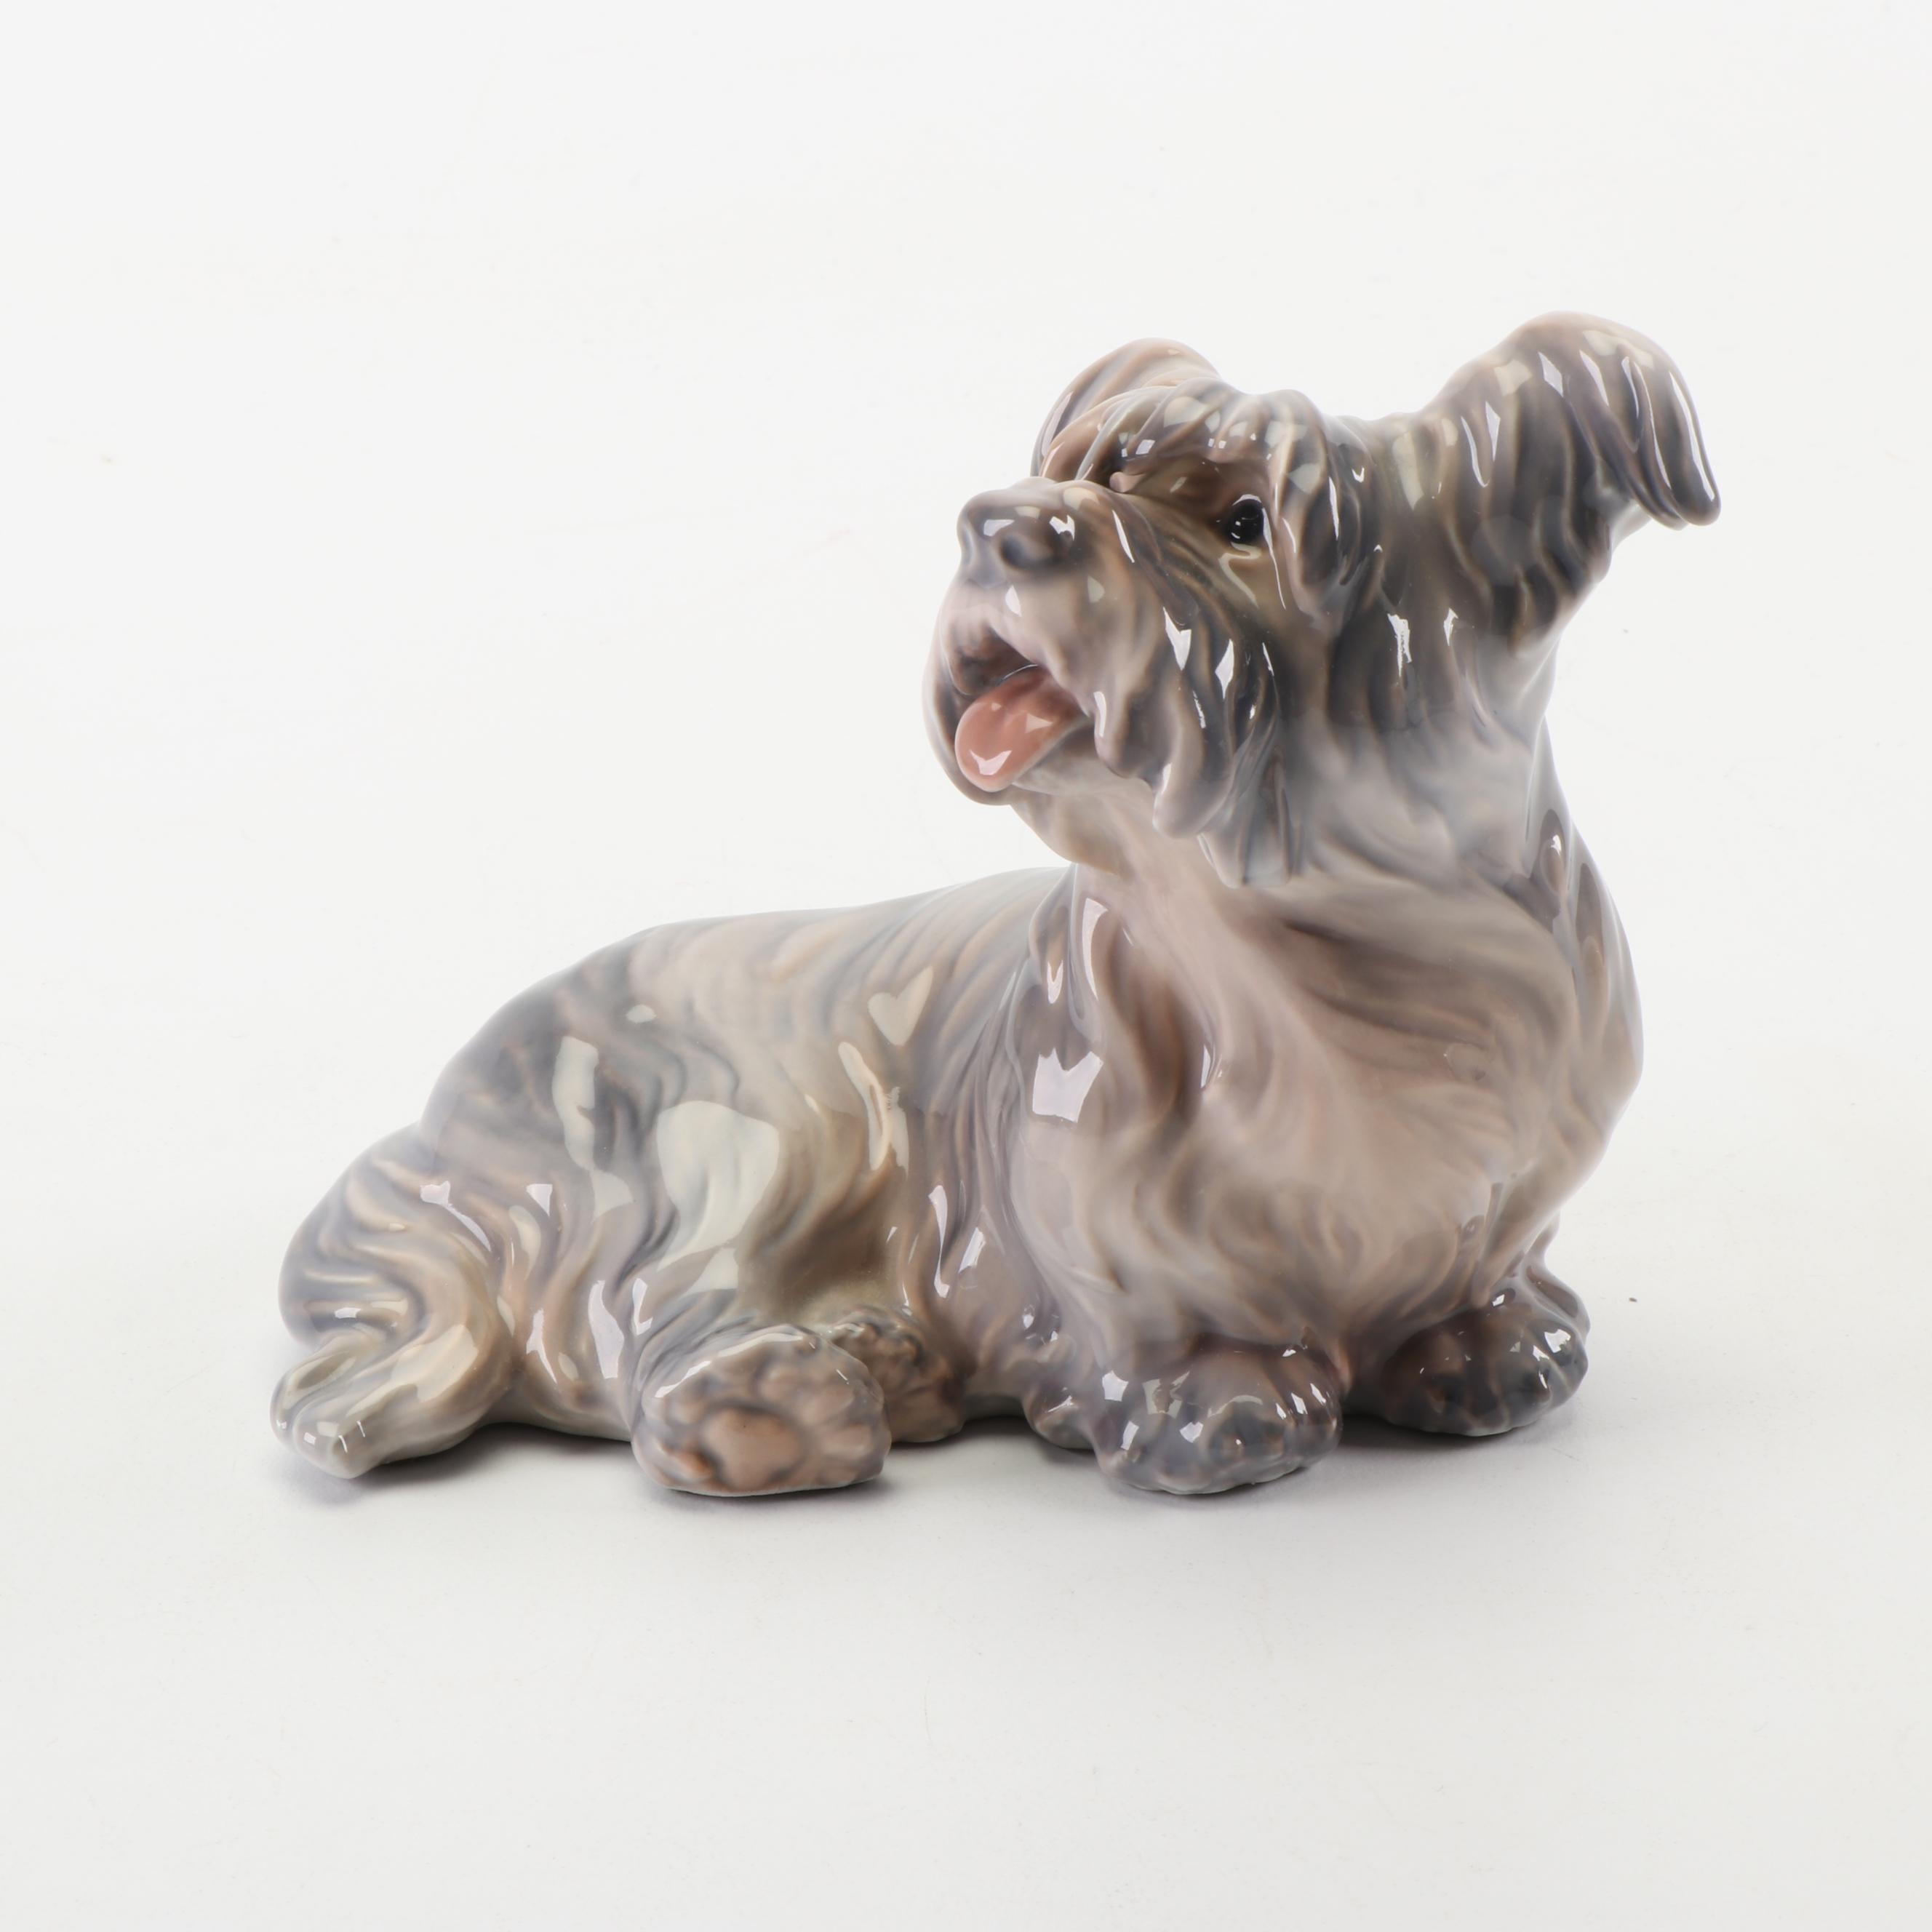 D.J. Copenhagen Porcelain Dog Figurine